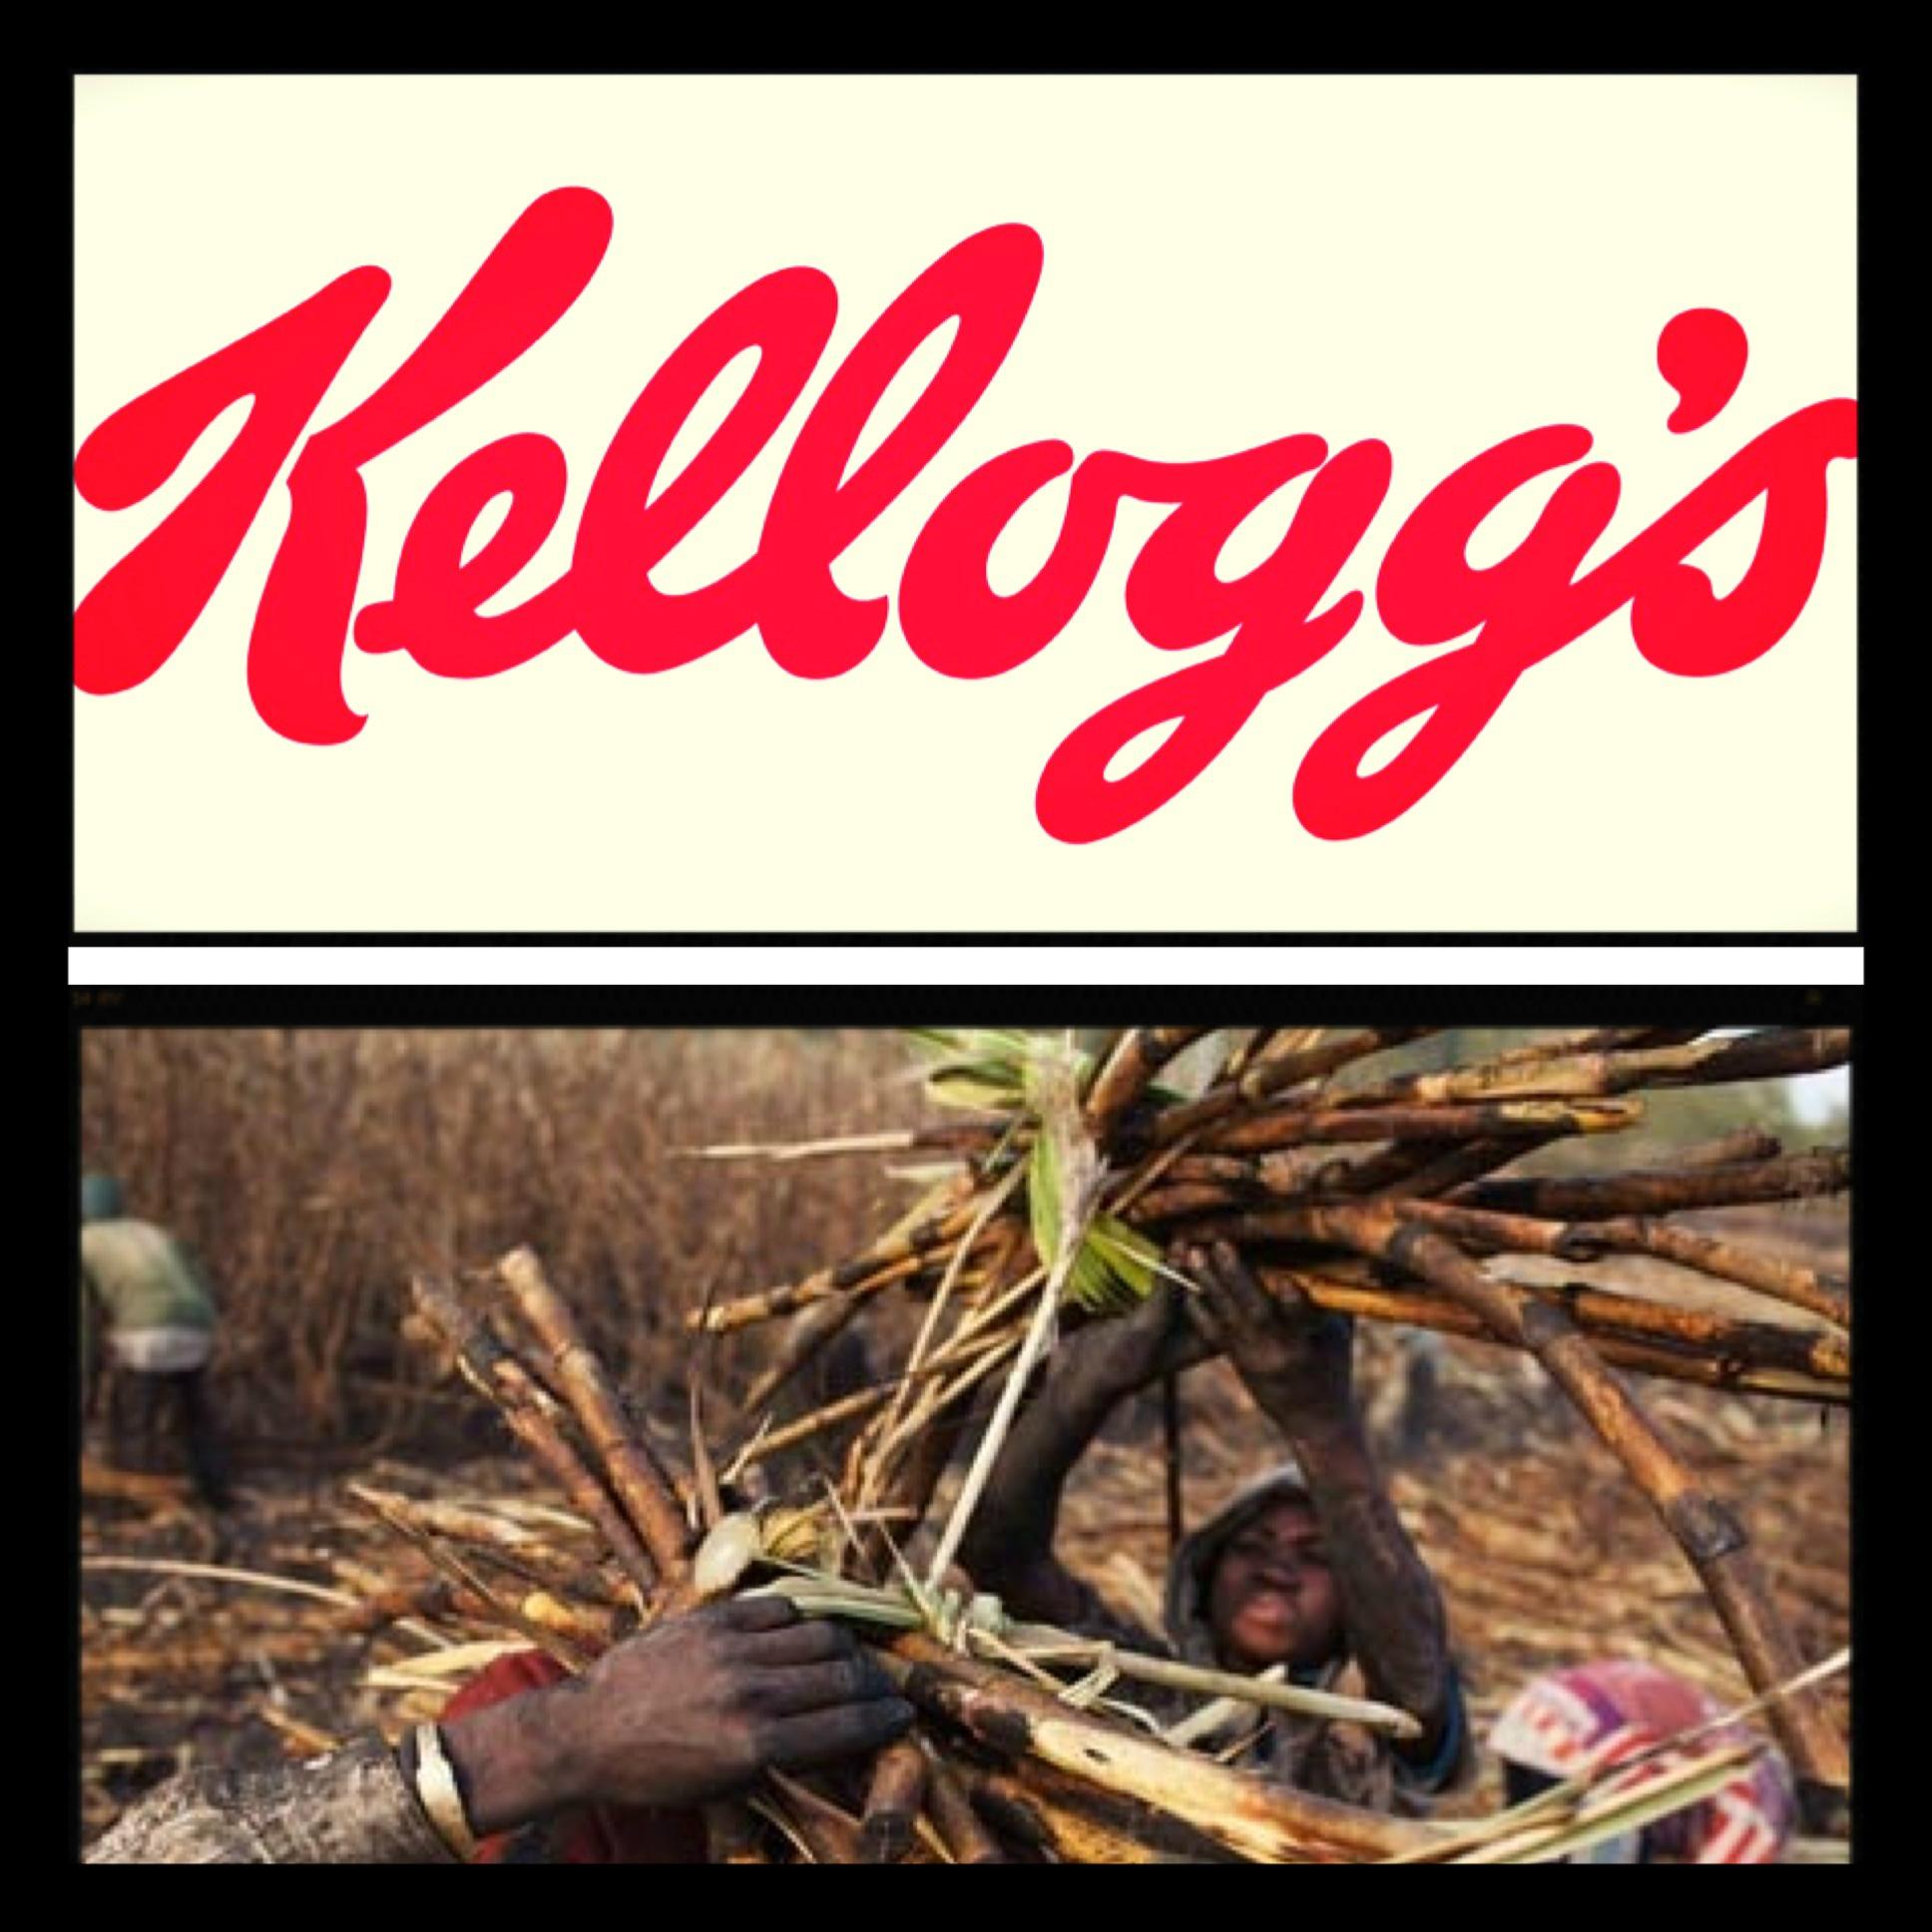 Kellogg's Falls Short